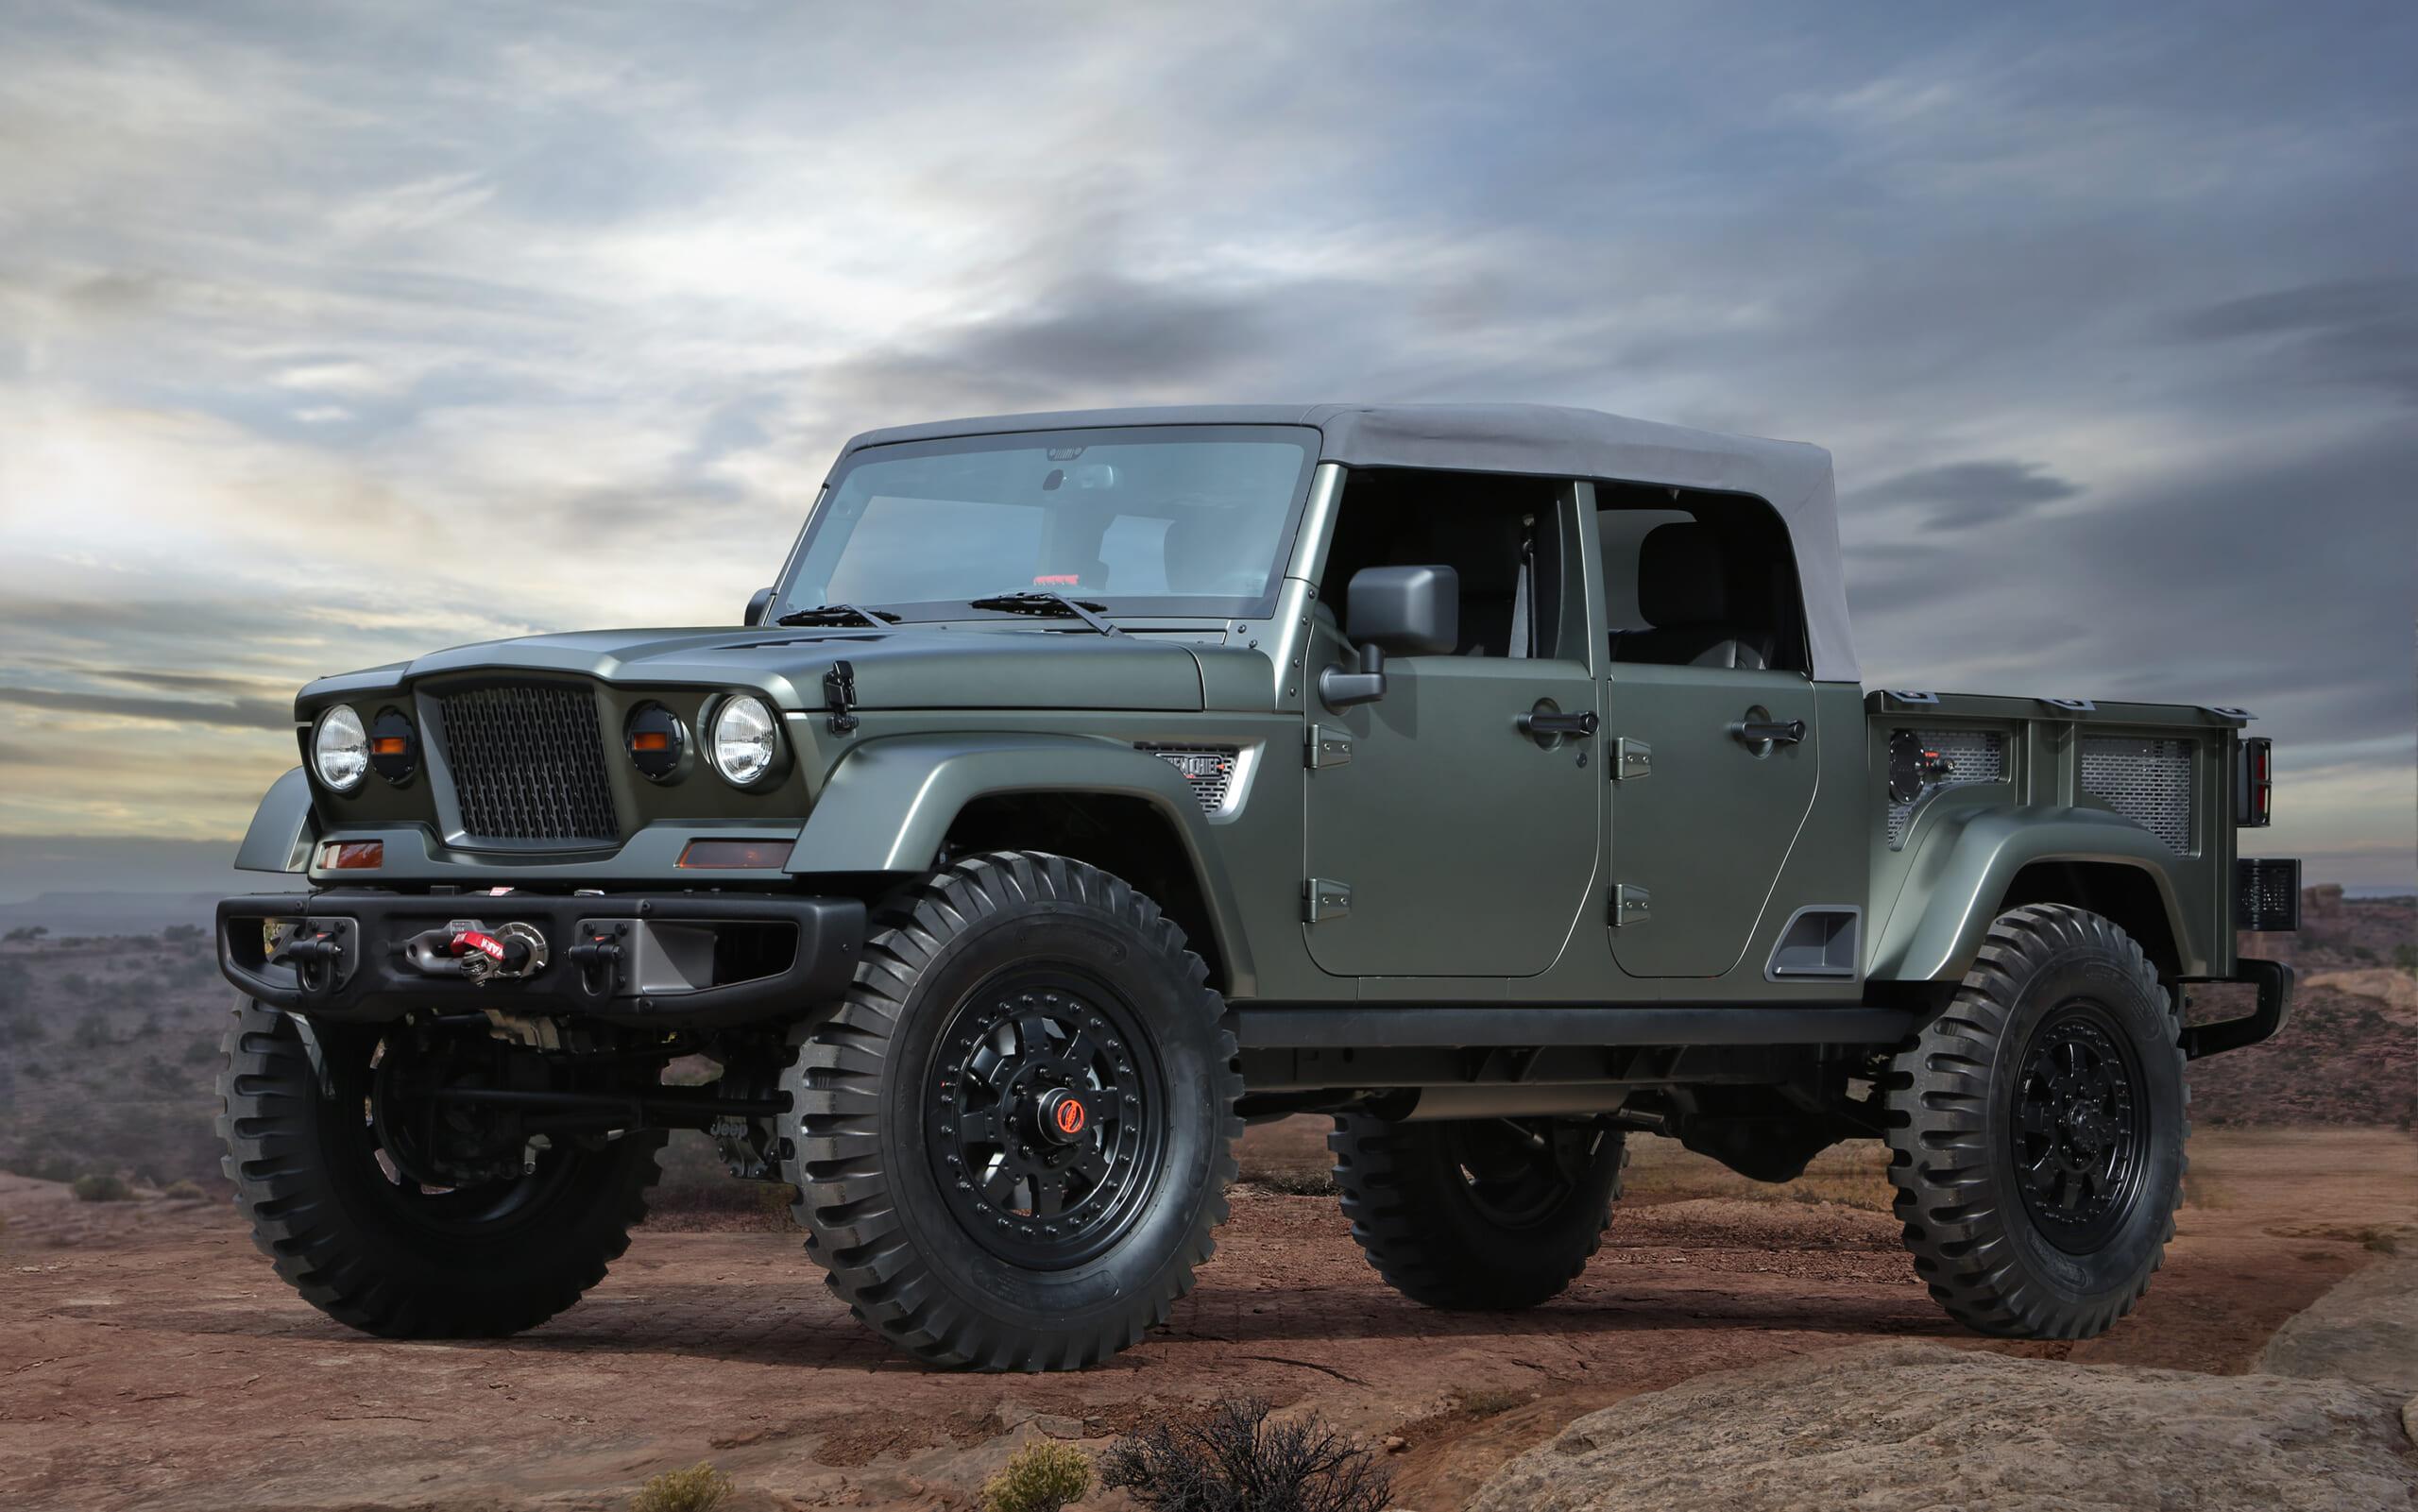 2016 Jeep Crew Chief concept